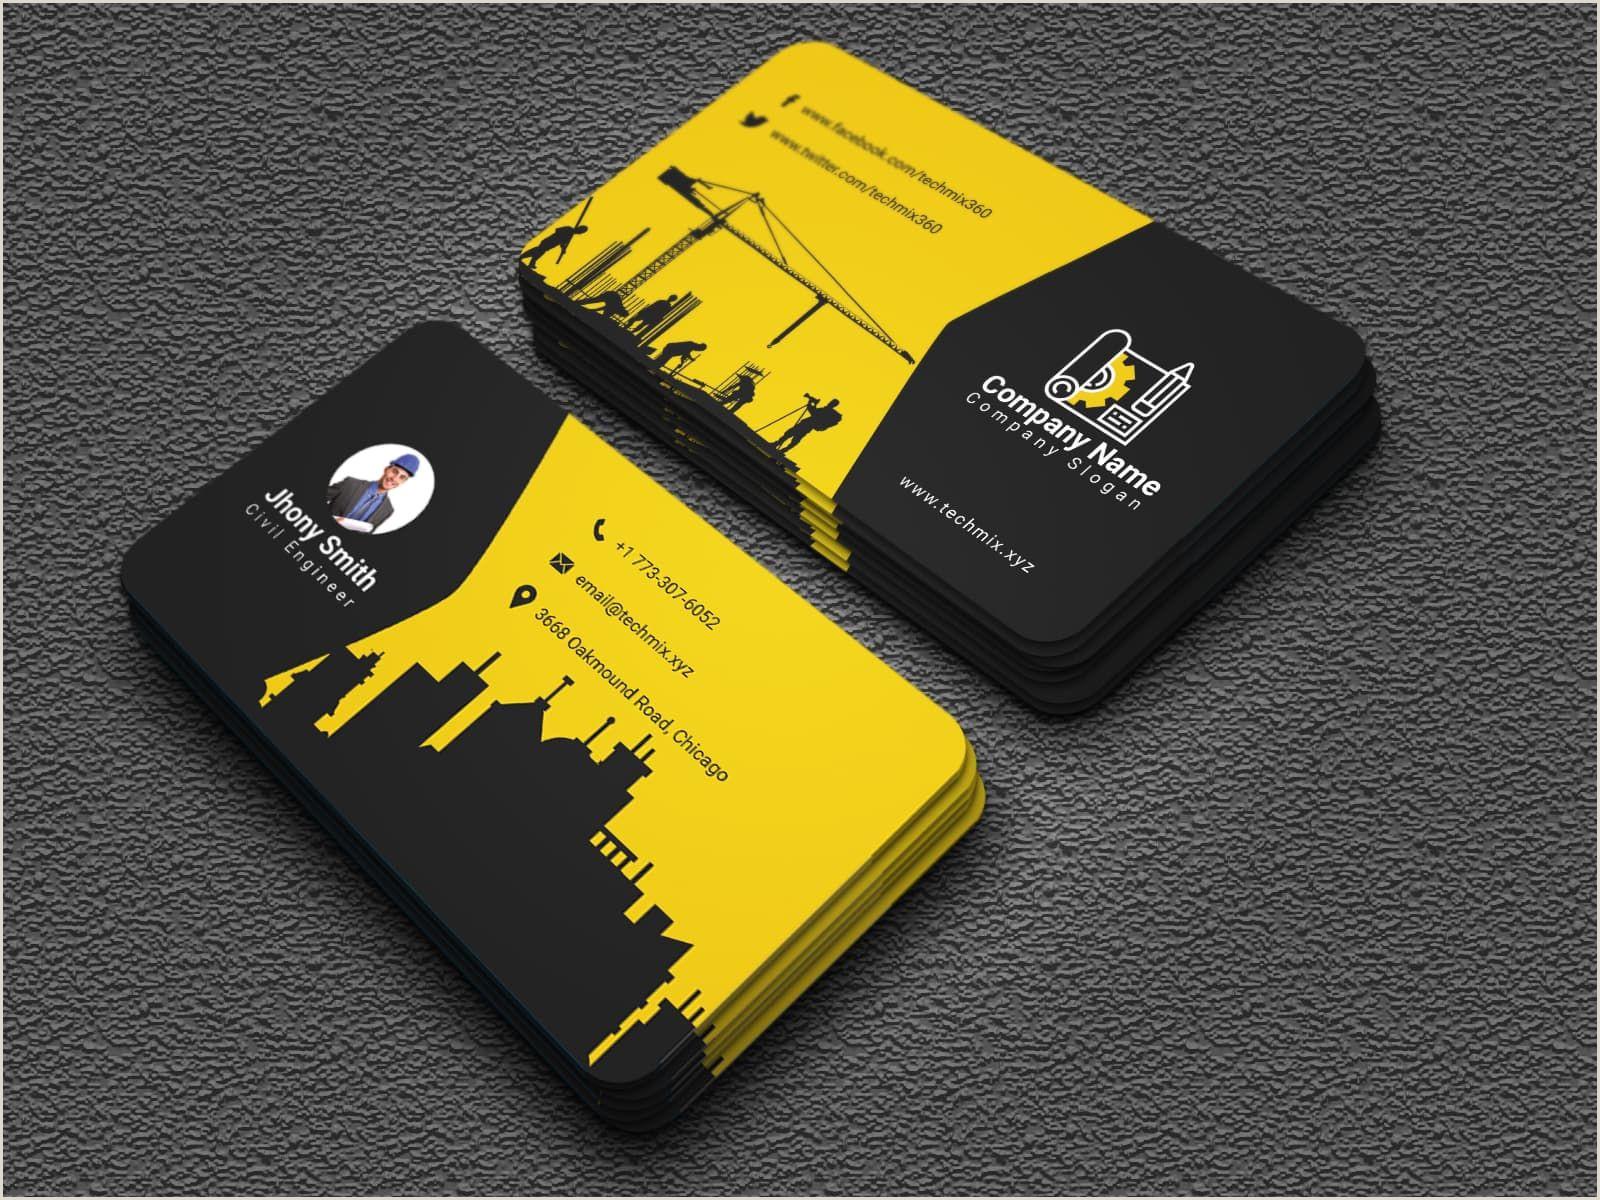 Best Business Cards Slogans Construction 10 Civil Engineer Business Cards Images